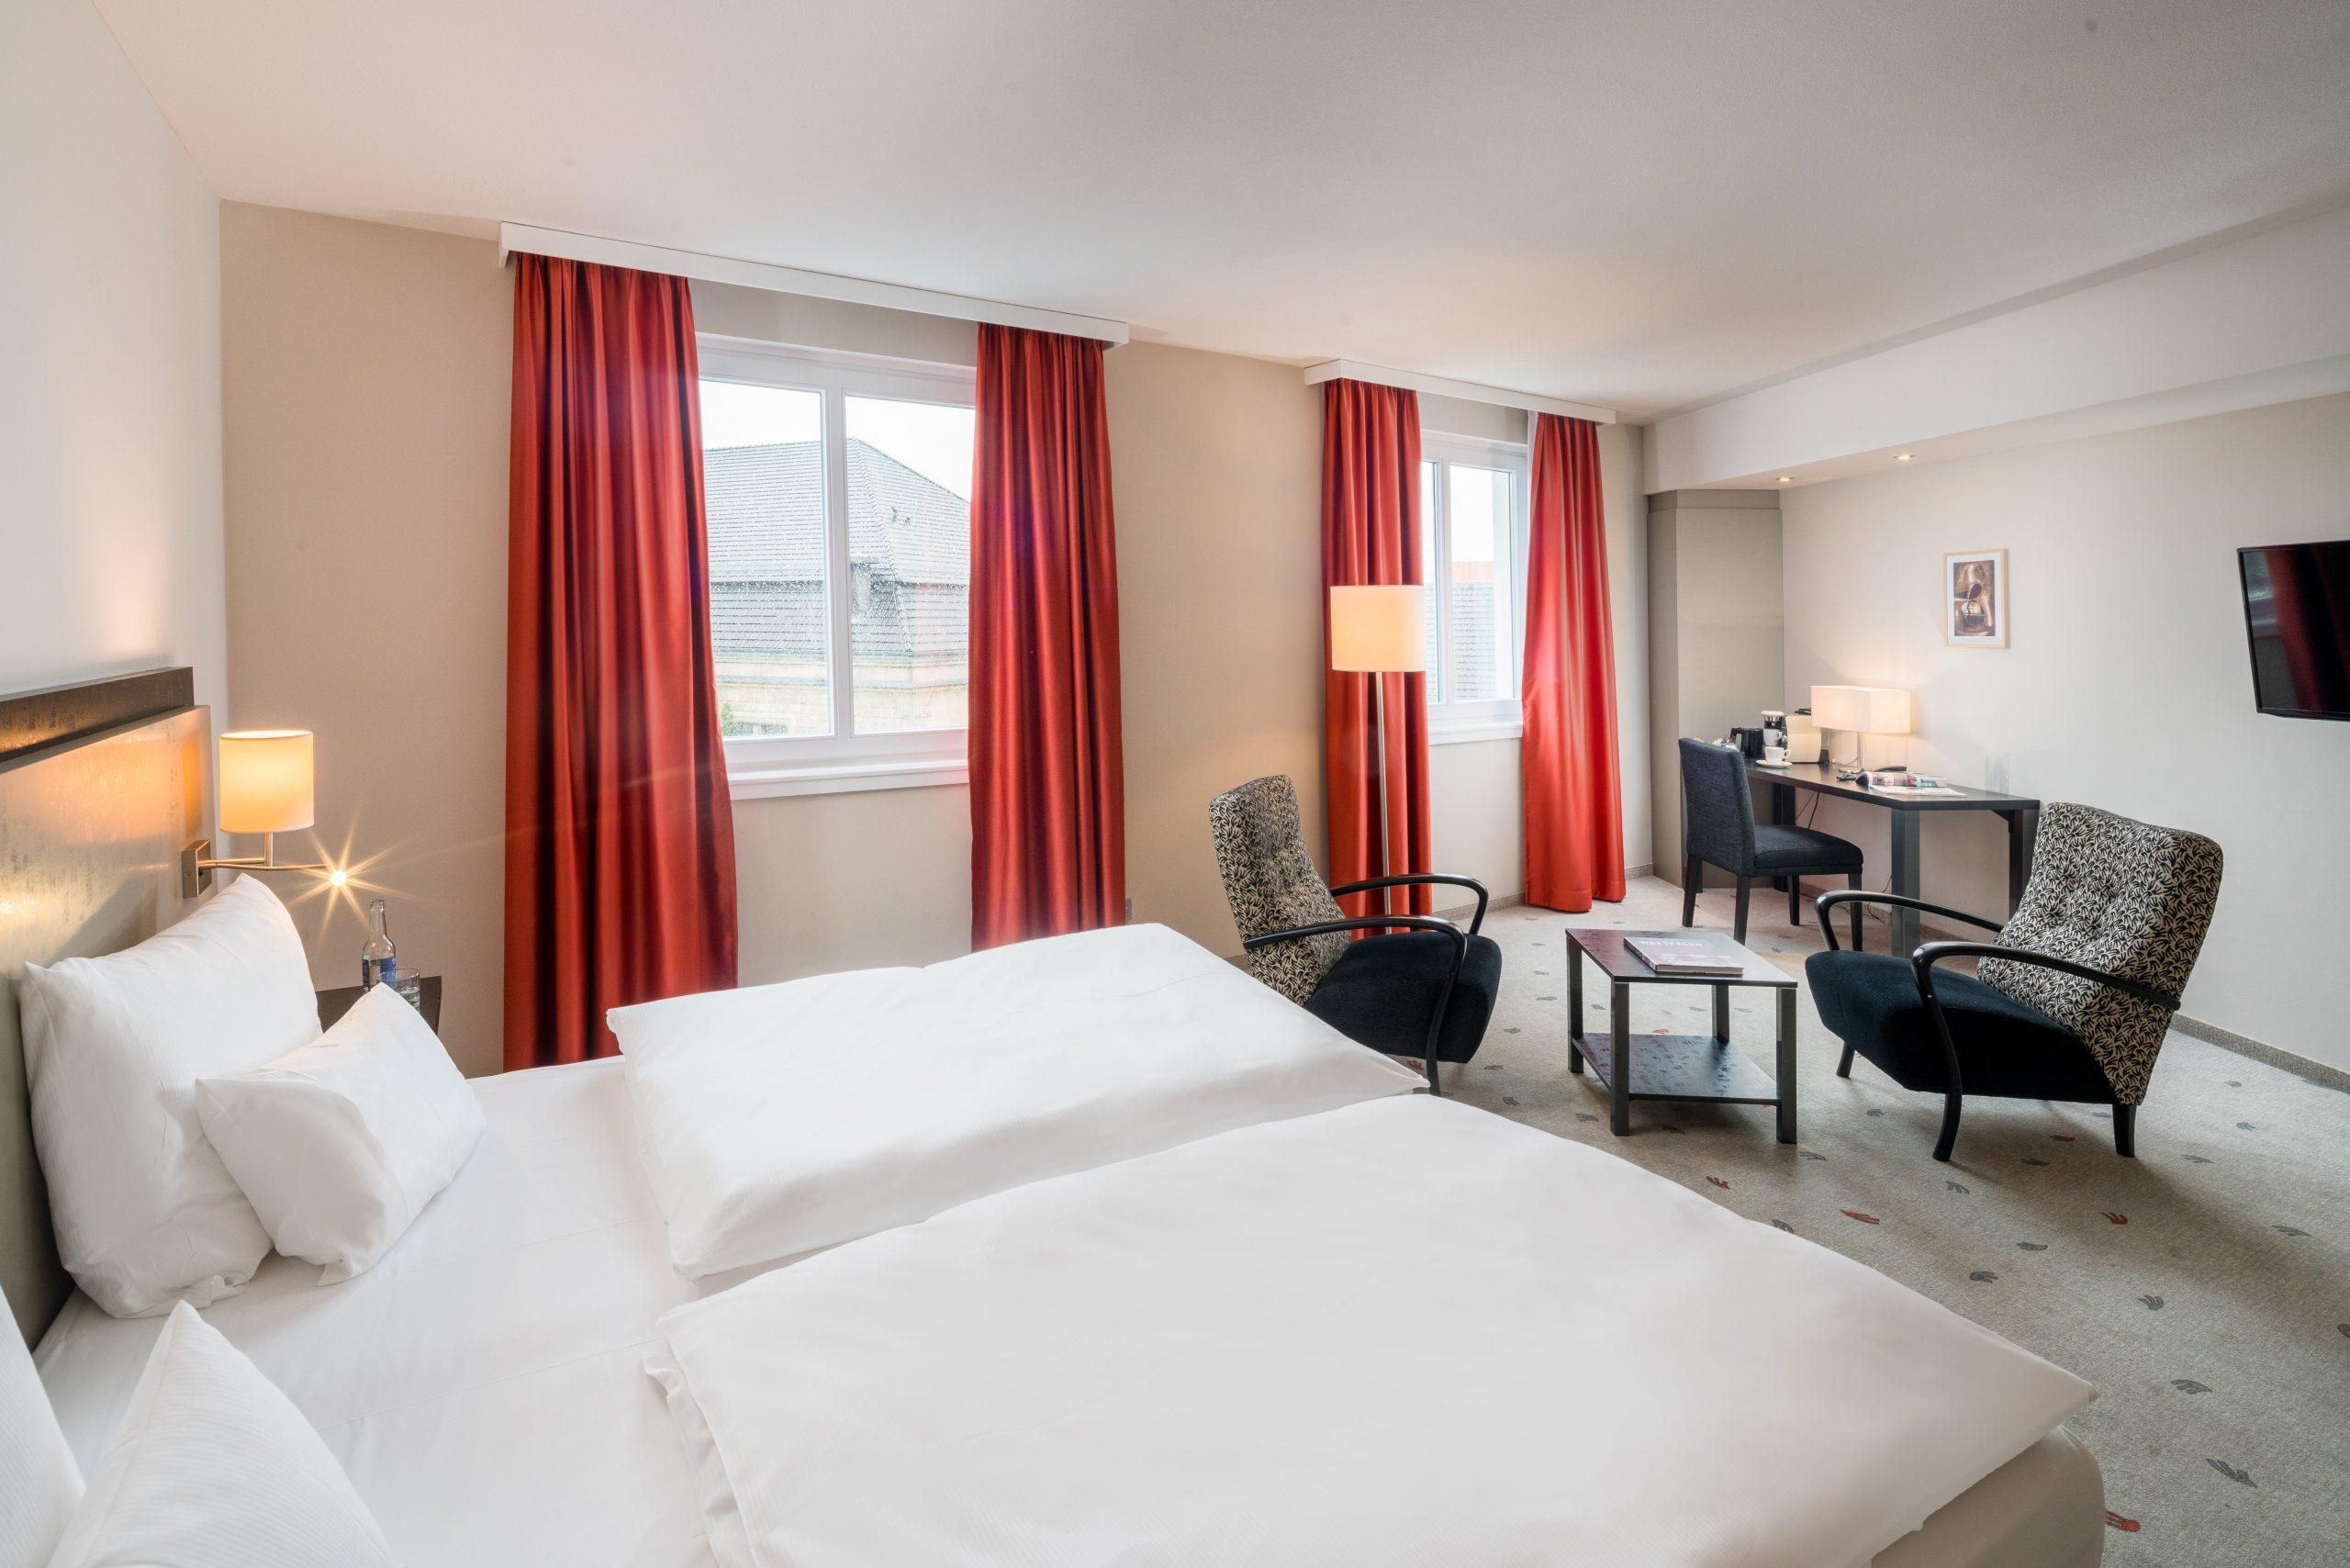 Bielefelder Hof großes Hotelzimmer